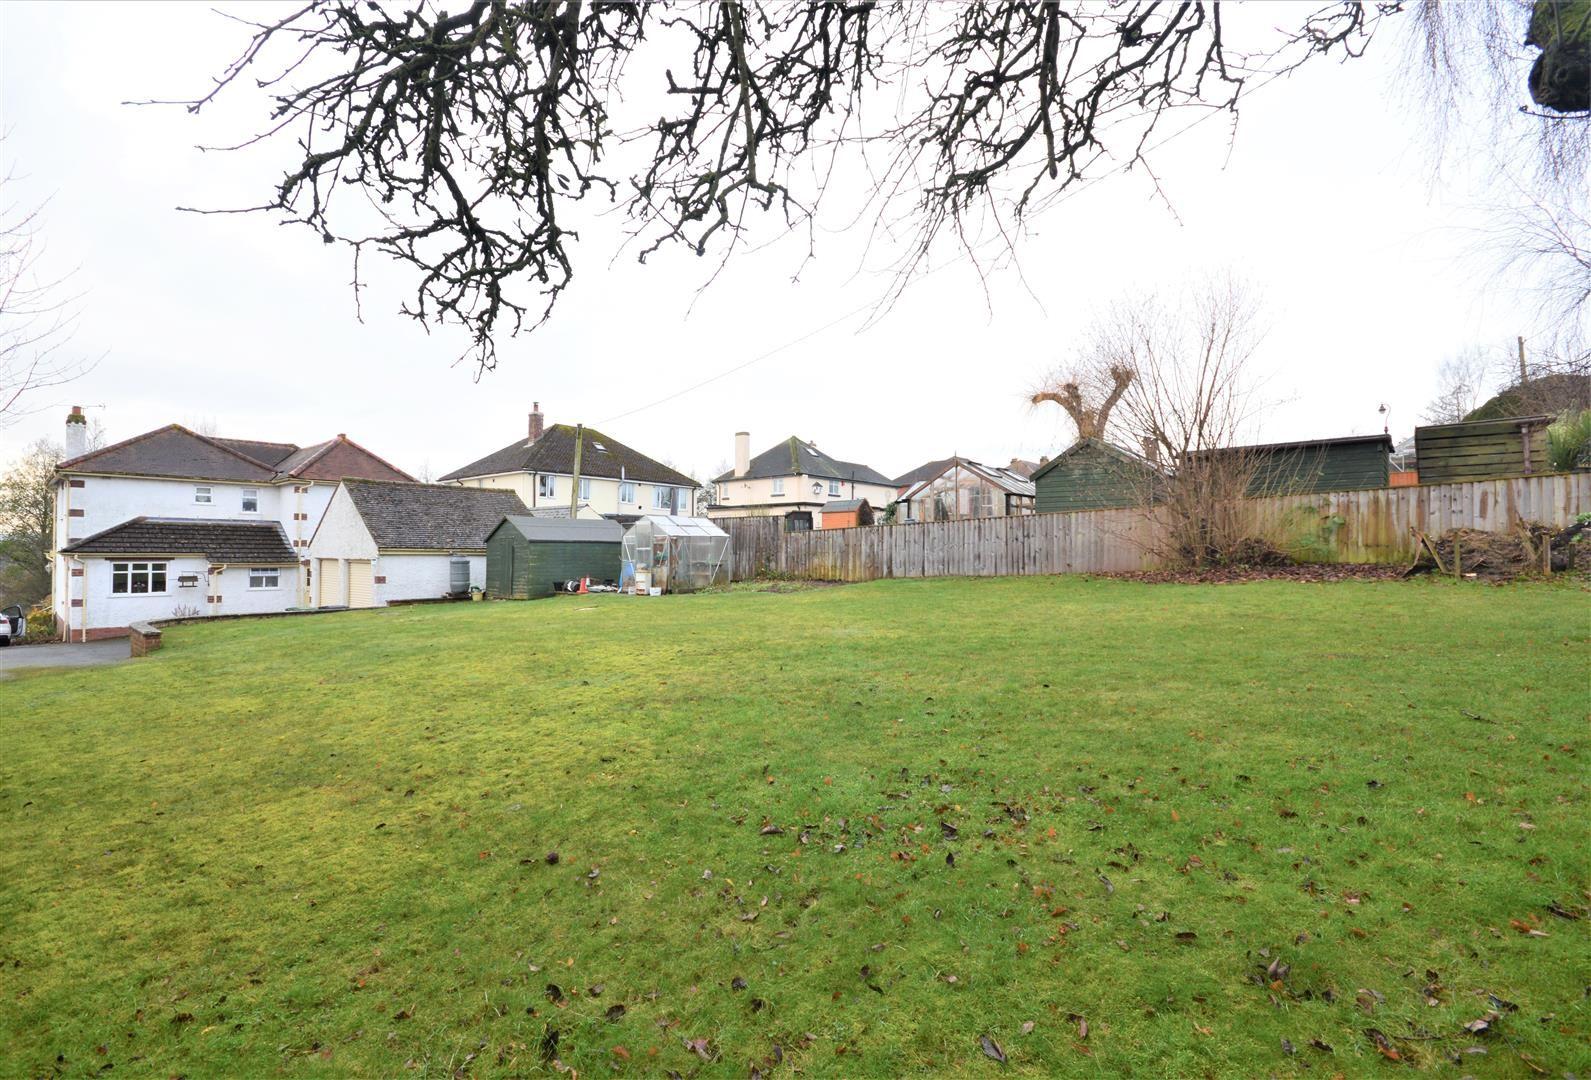 4 bed detached for sale in Bobblestock - Property Image 1